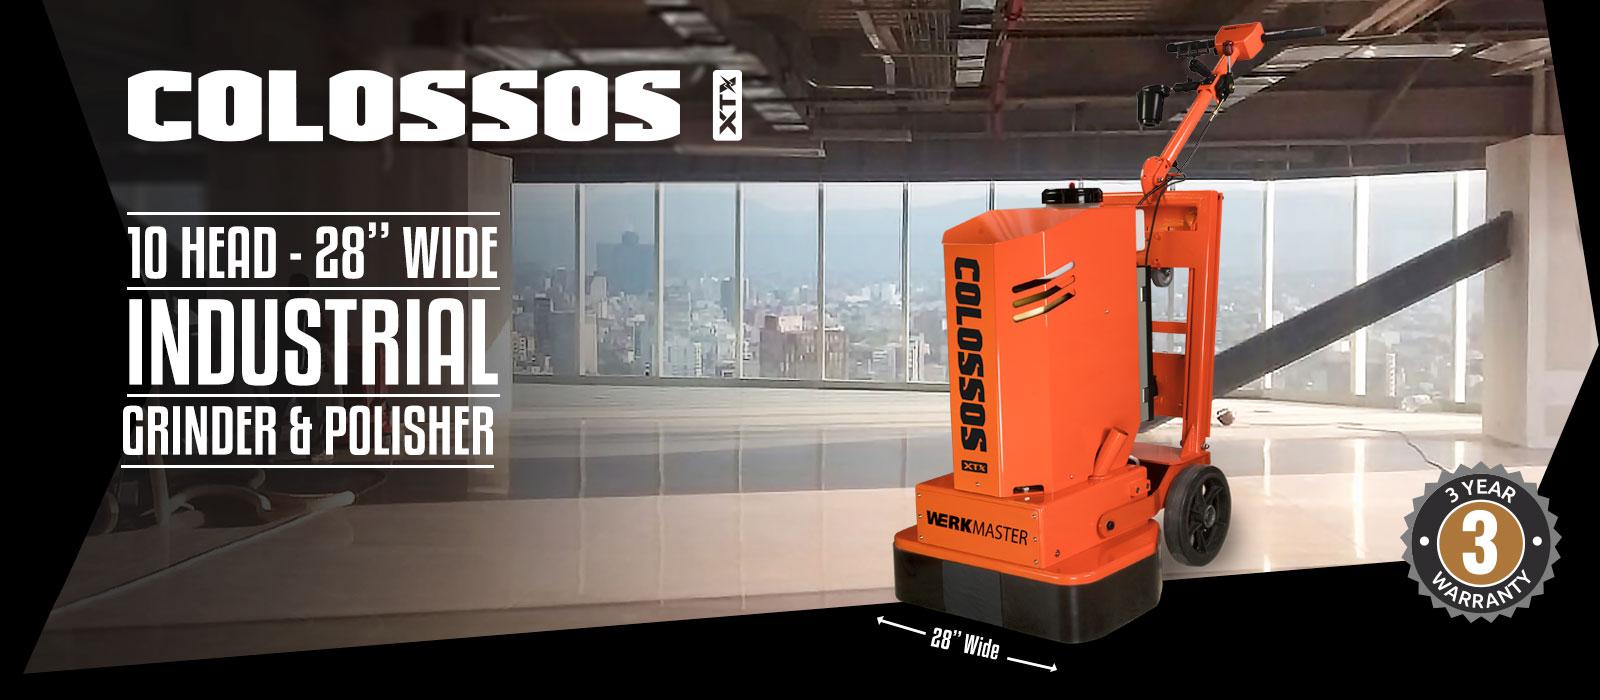 Colossos XTX - 10 Head, 28